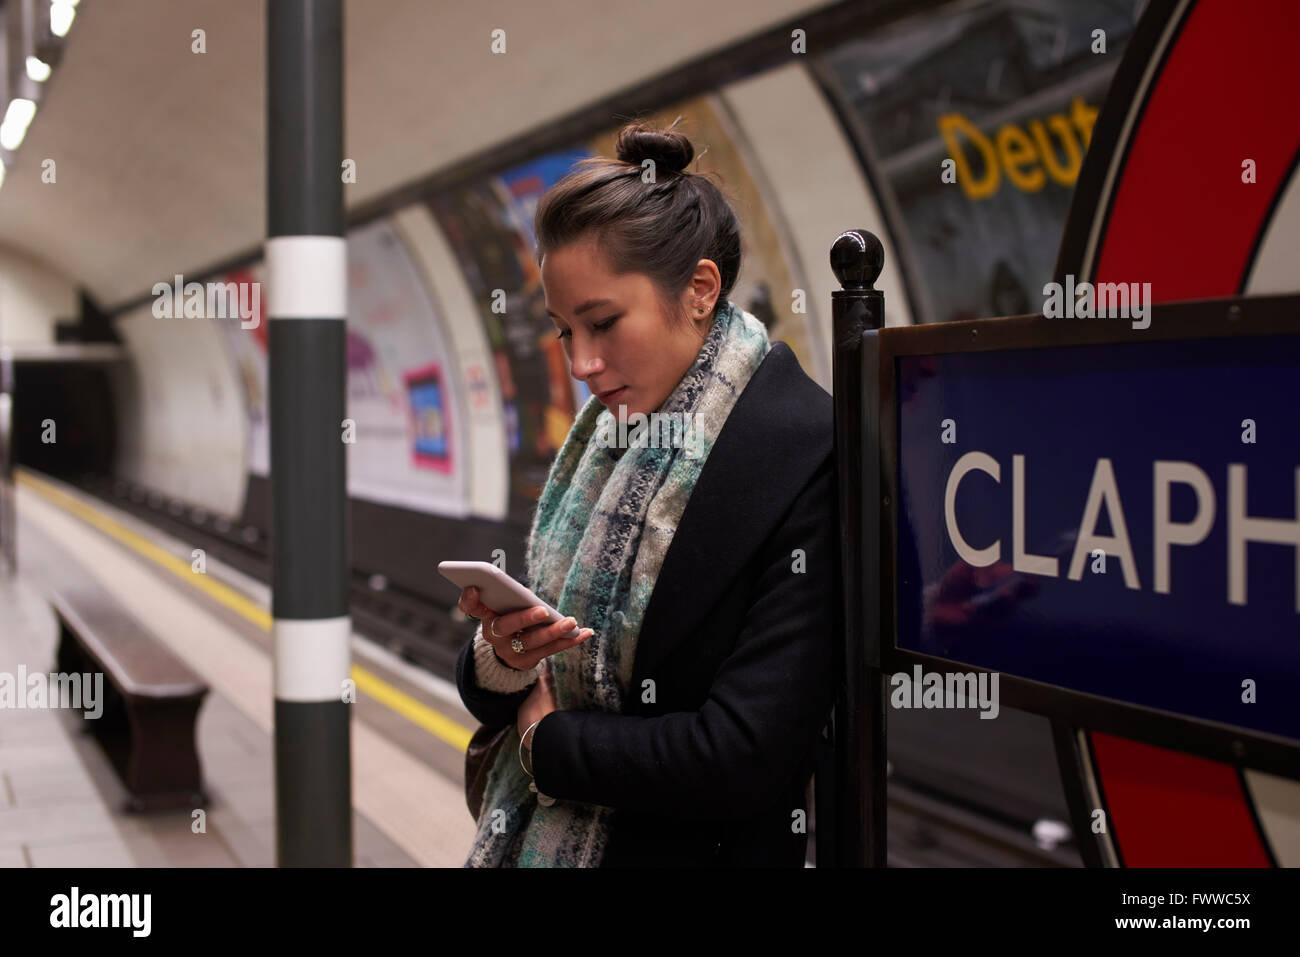 Frau stehen am Bahnsteig, Blick auf SMS Stockbild